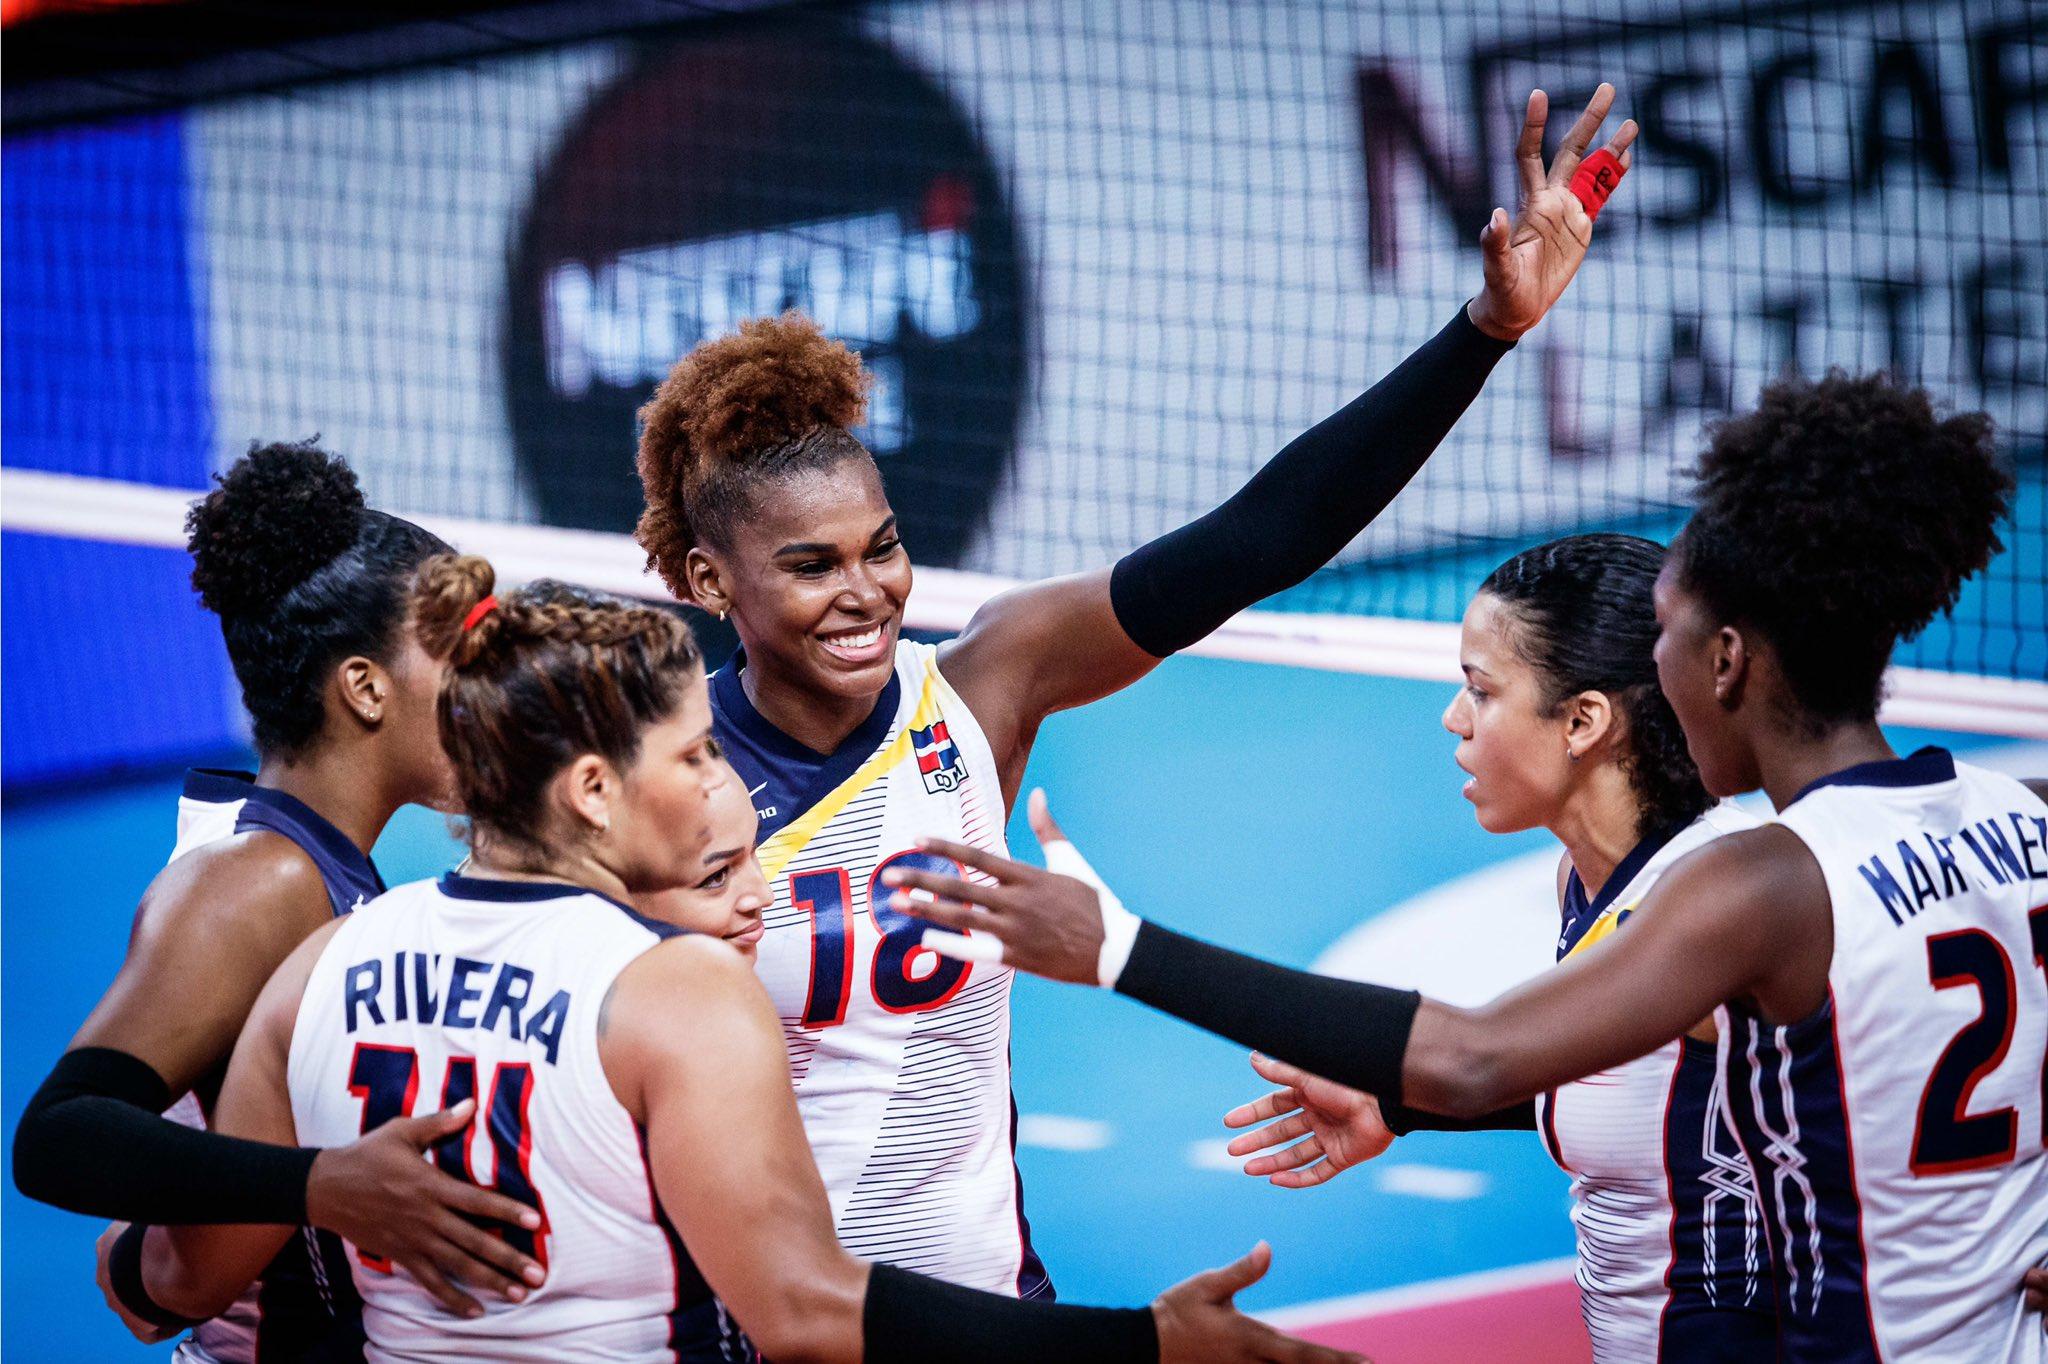 Voleibol RD femenino da a conocer jugadora van a Tokio 2020